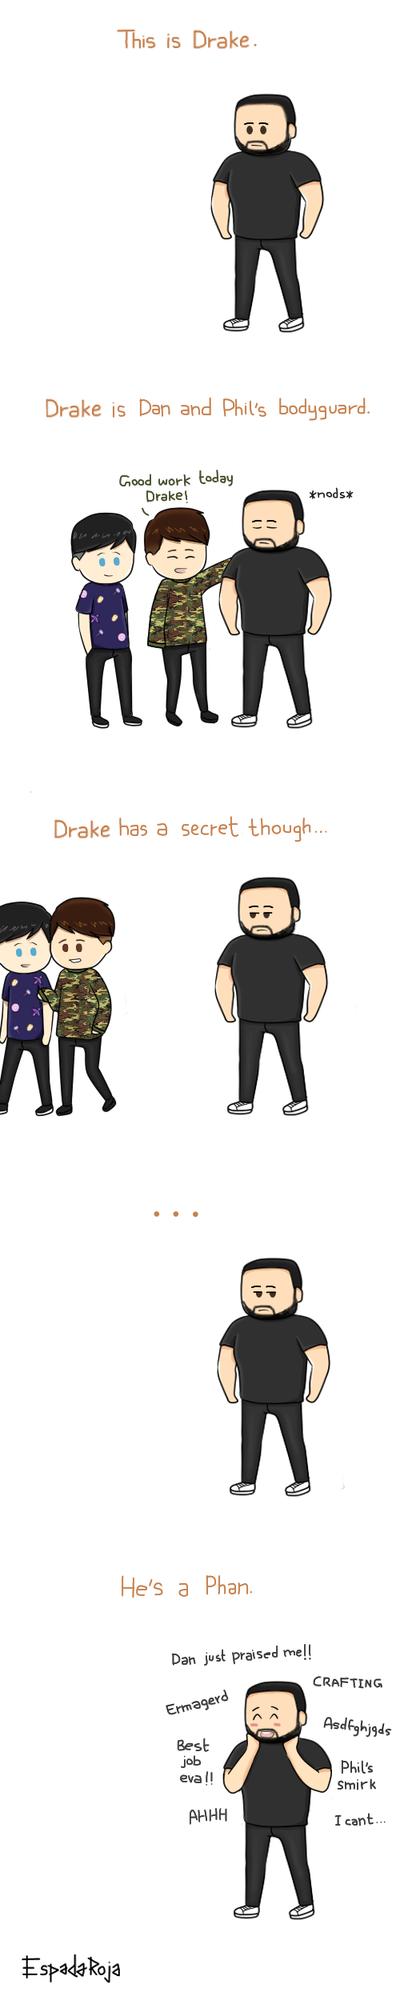 Drake the bodyguard by espadaroja